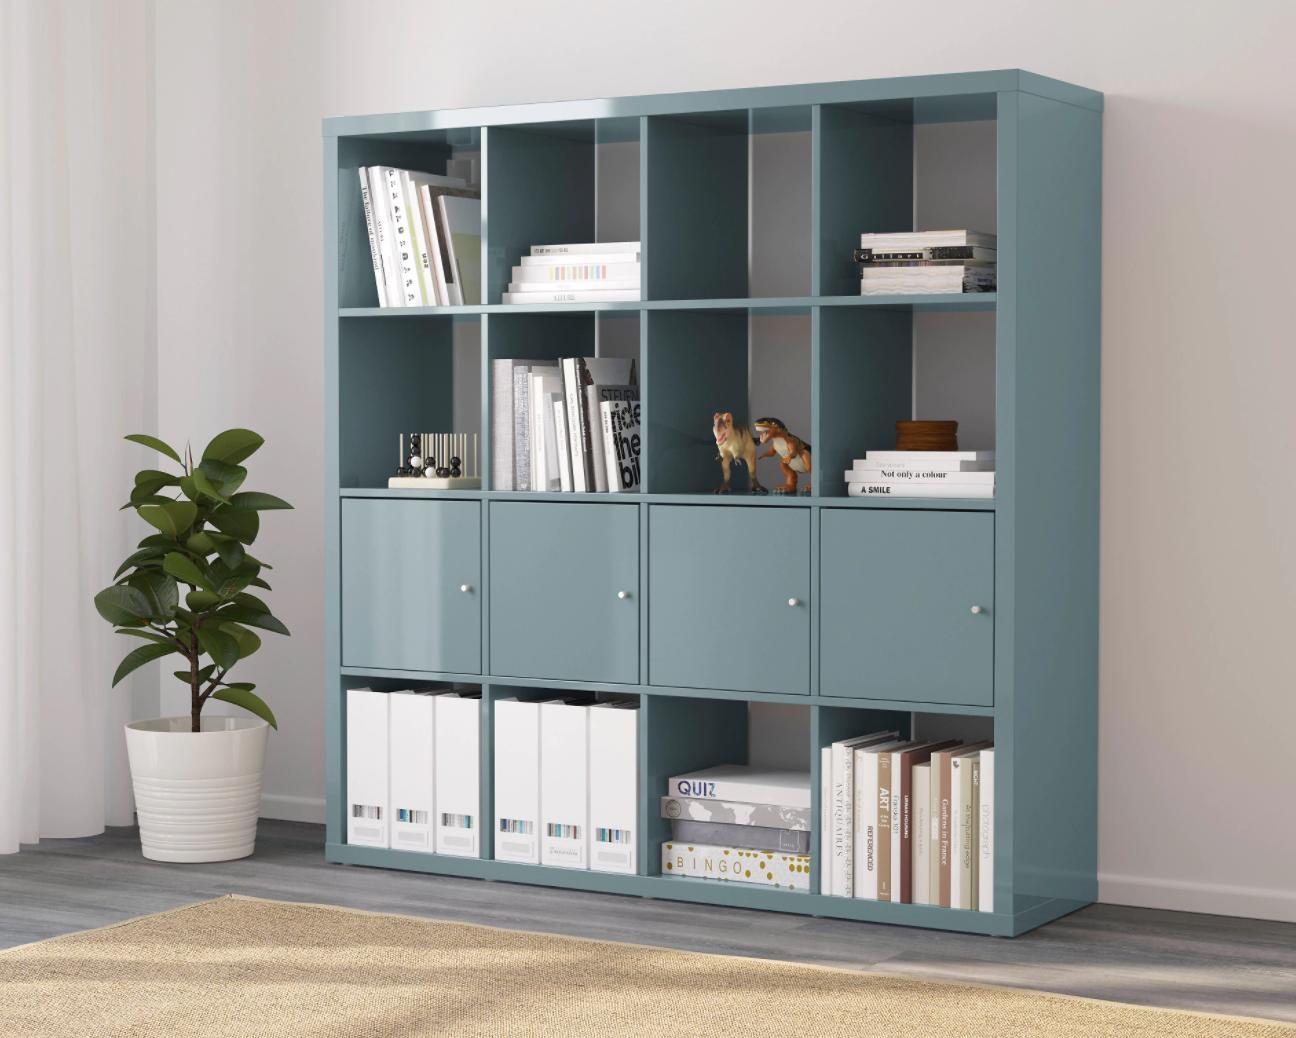 IKEA unit